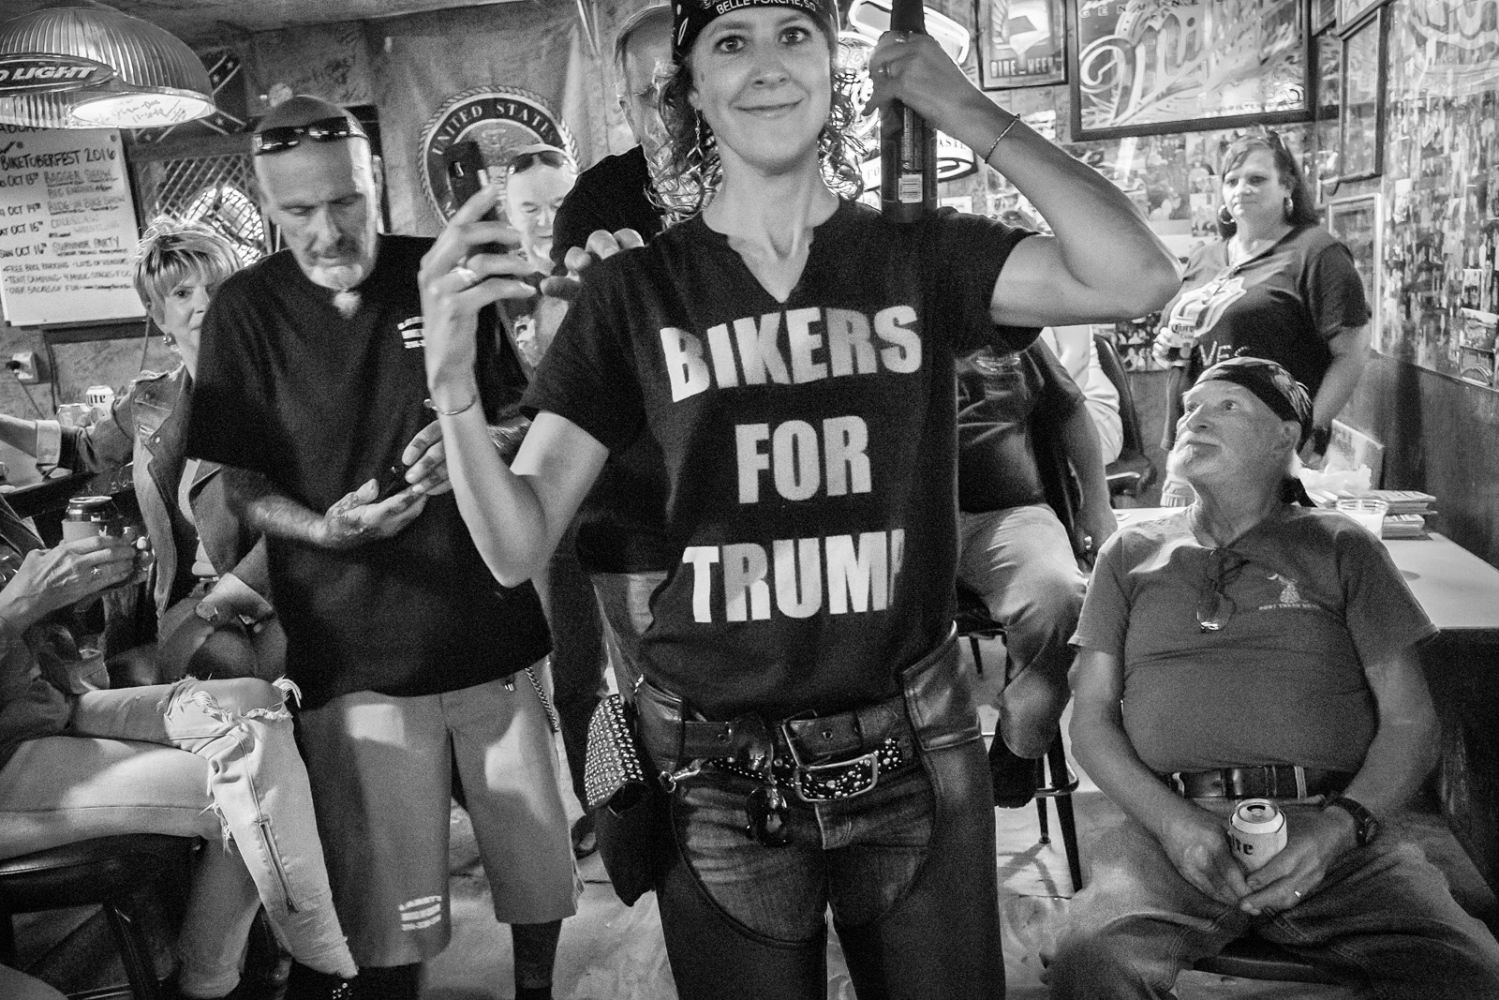 Bikers for Trump Cabbage Patch Bar, Samsula, Florida